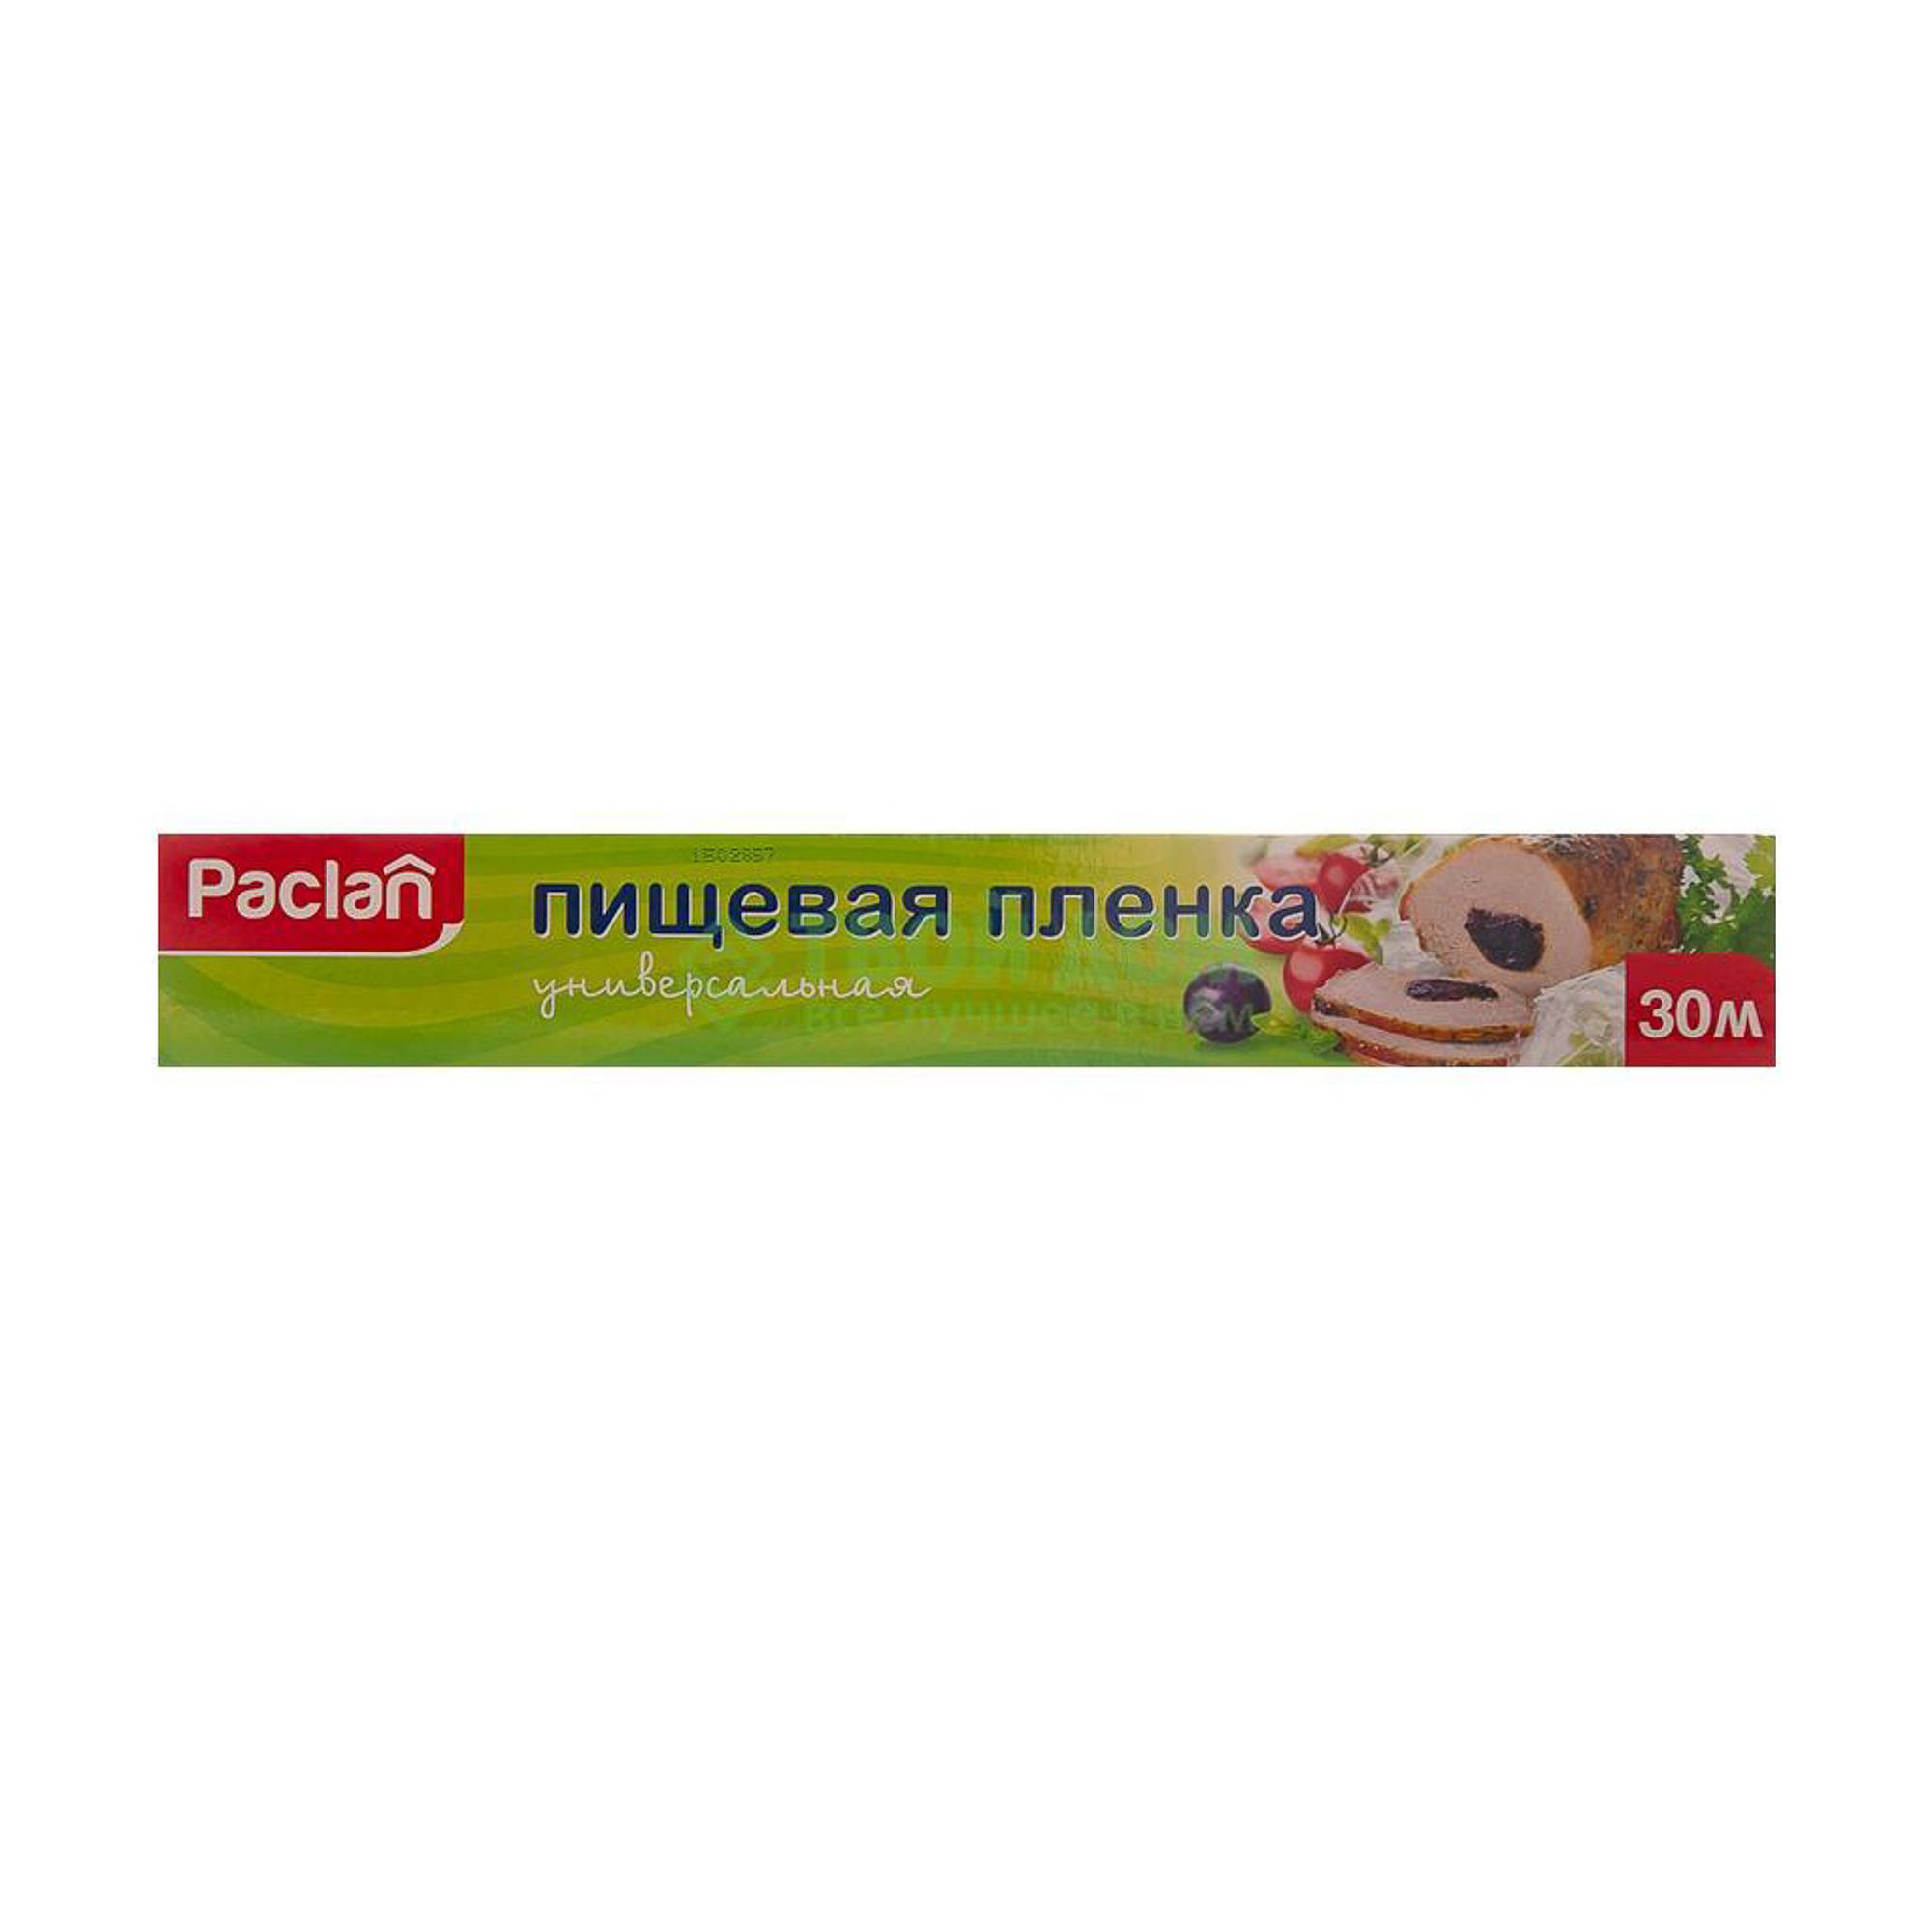 Пленка пищевая Paclan из ПЭ 30м х 29см.